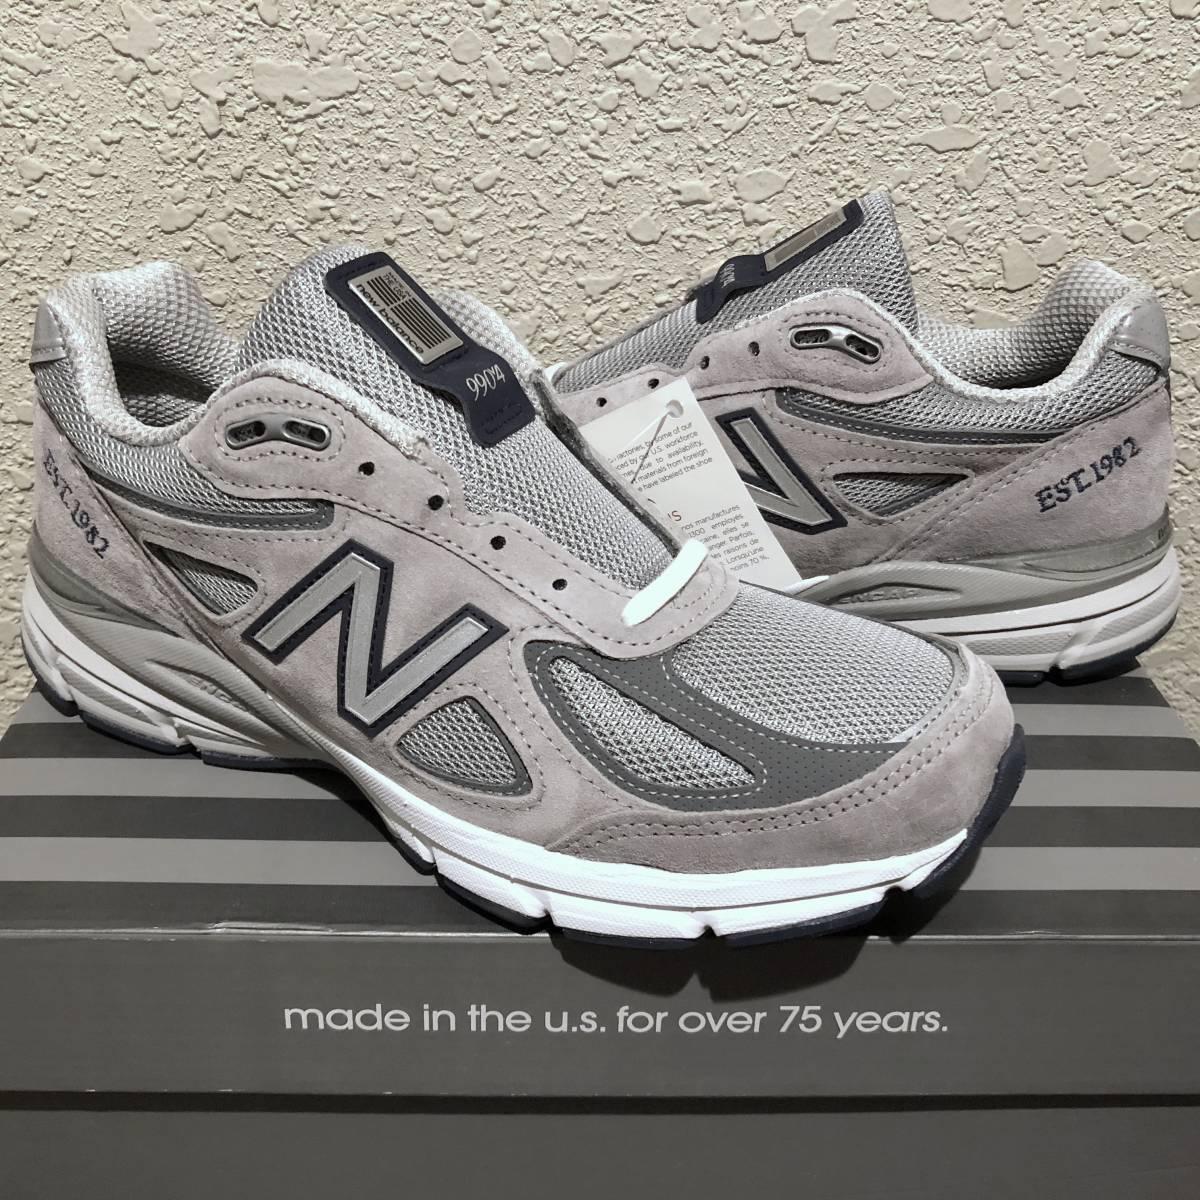 online store b6087 cfa92 domestic 99 pair limitation USA made NEW BALANCE M990NB4 ...